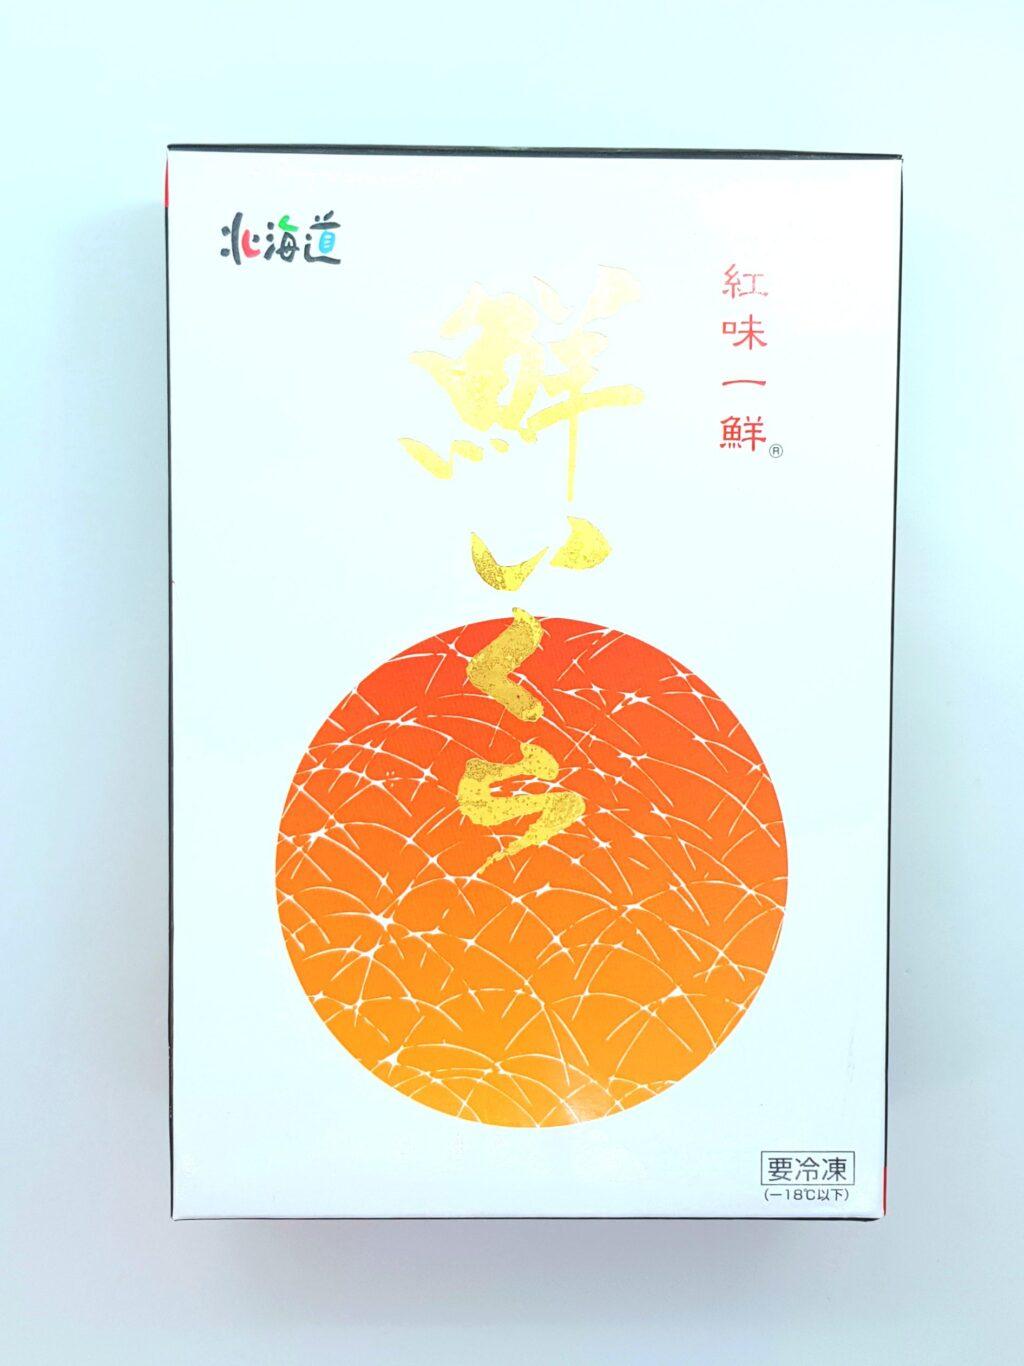 Shiki Singapore Delivery Frozen Premium Sake Ikura No-Seasoning (Hokkaido Salmon Roe) 500g/1kg *Home Chef Level Product* Unseasoned Roe, Salmon Roe, Ikura